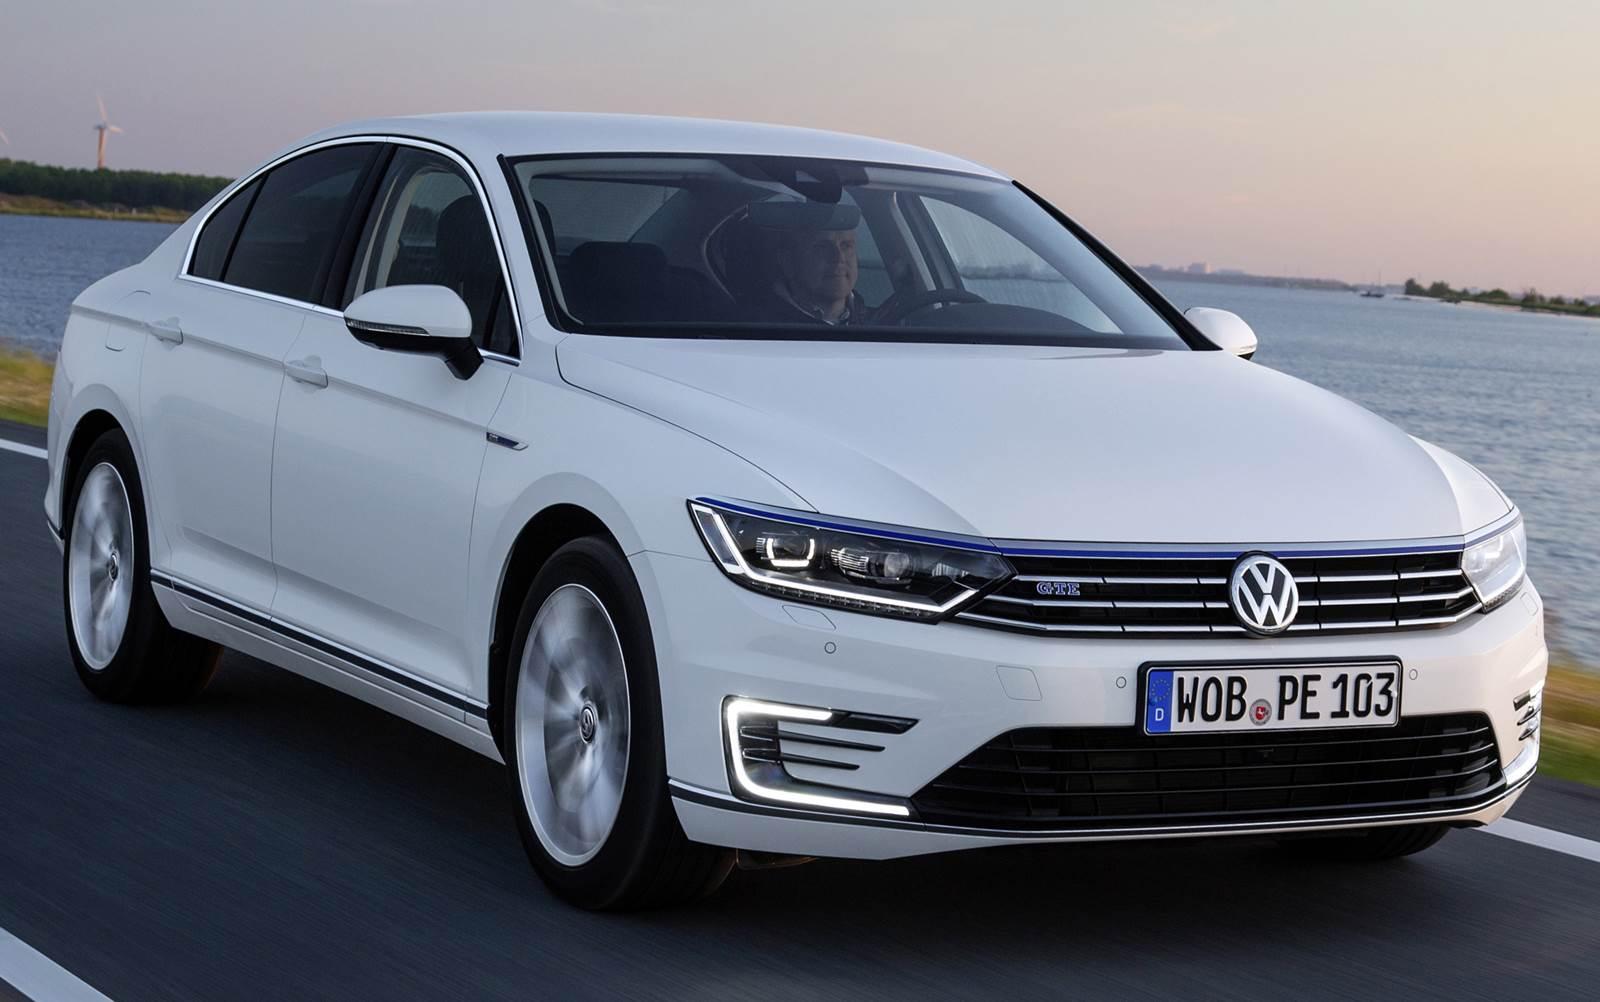 Volkswagen  - Investimento em Pesquisa e Desenvolvimento